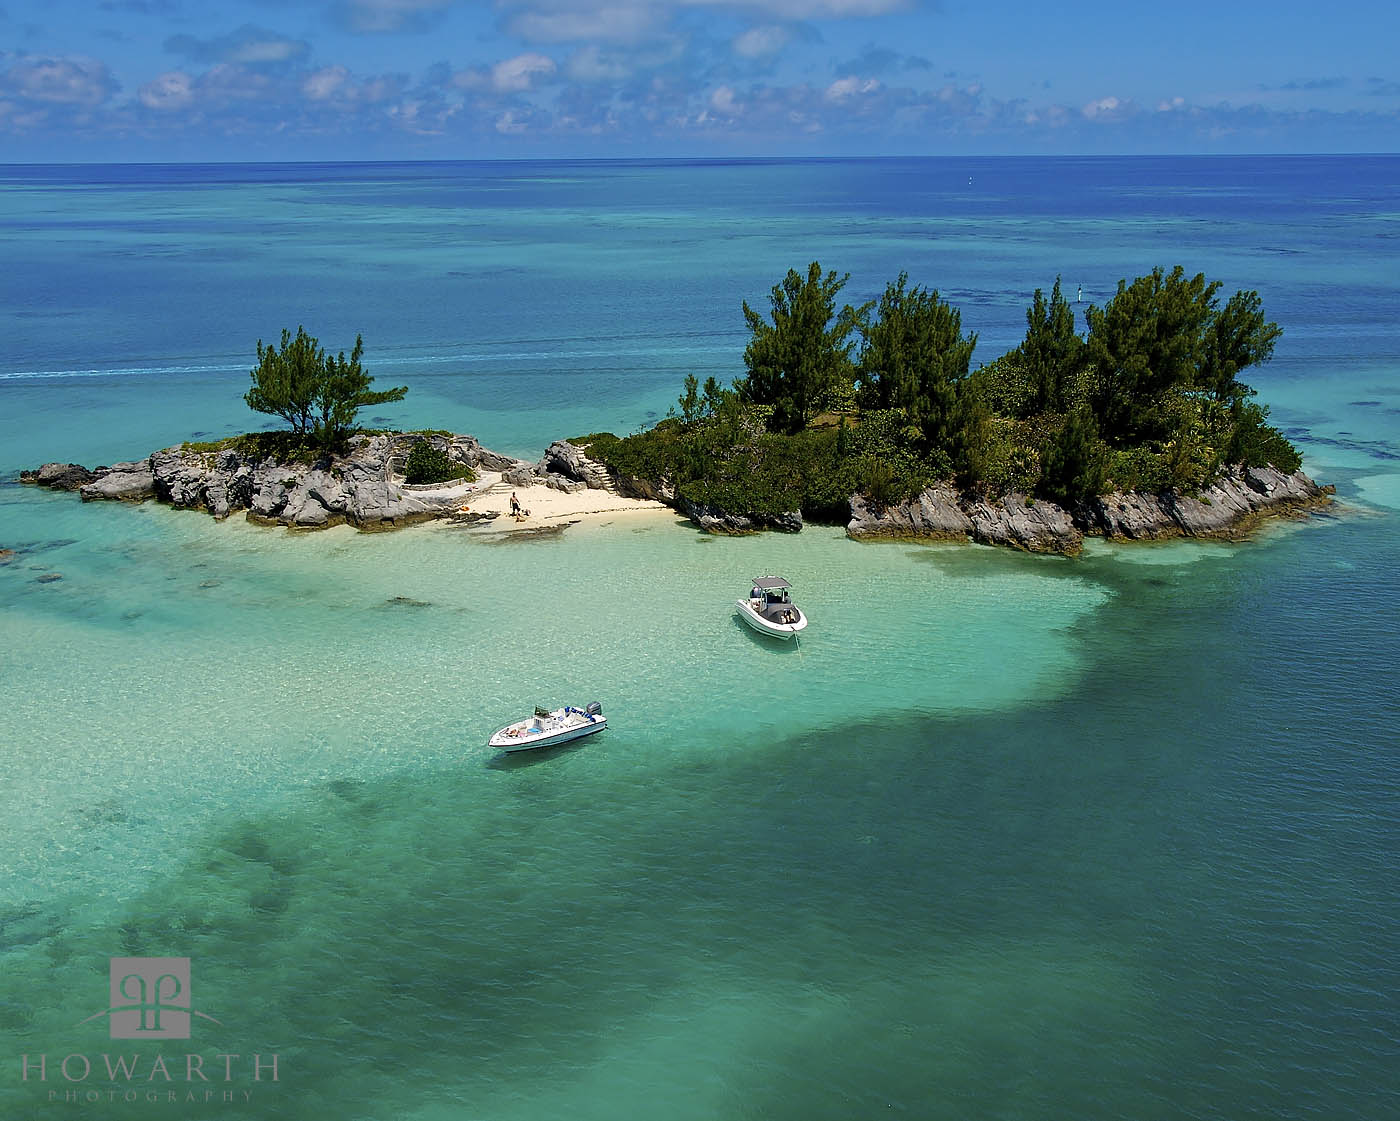 kings, point, mangrove, bay, somerset, summer, summertime, boat, photo